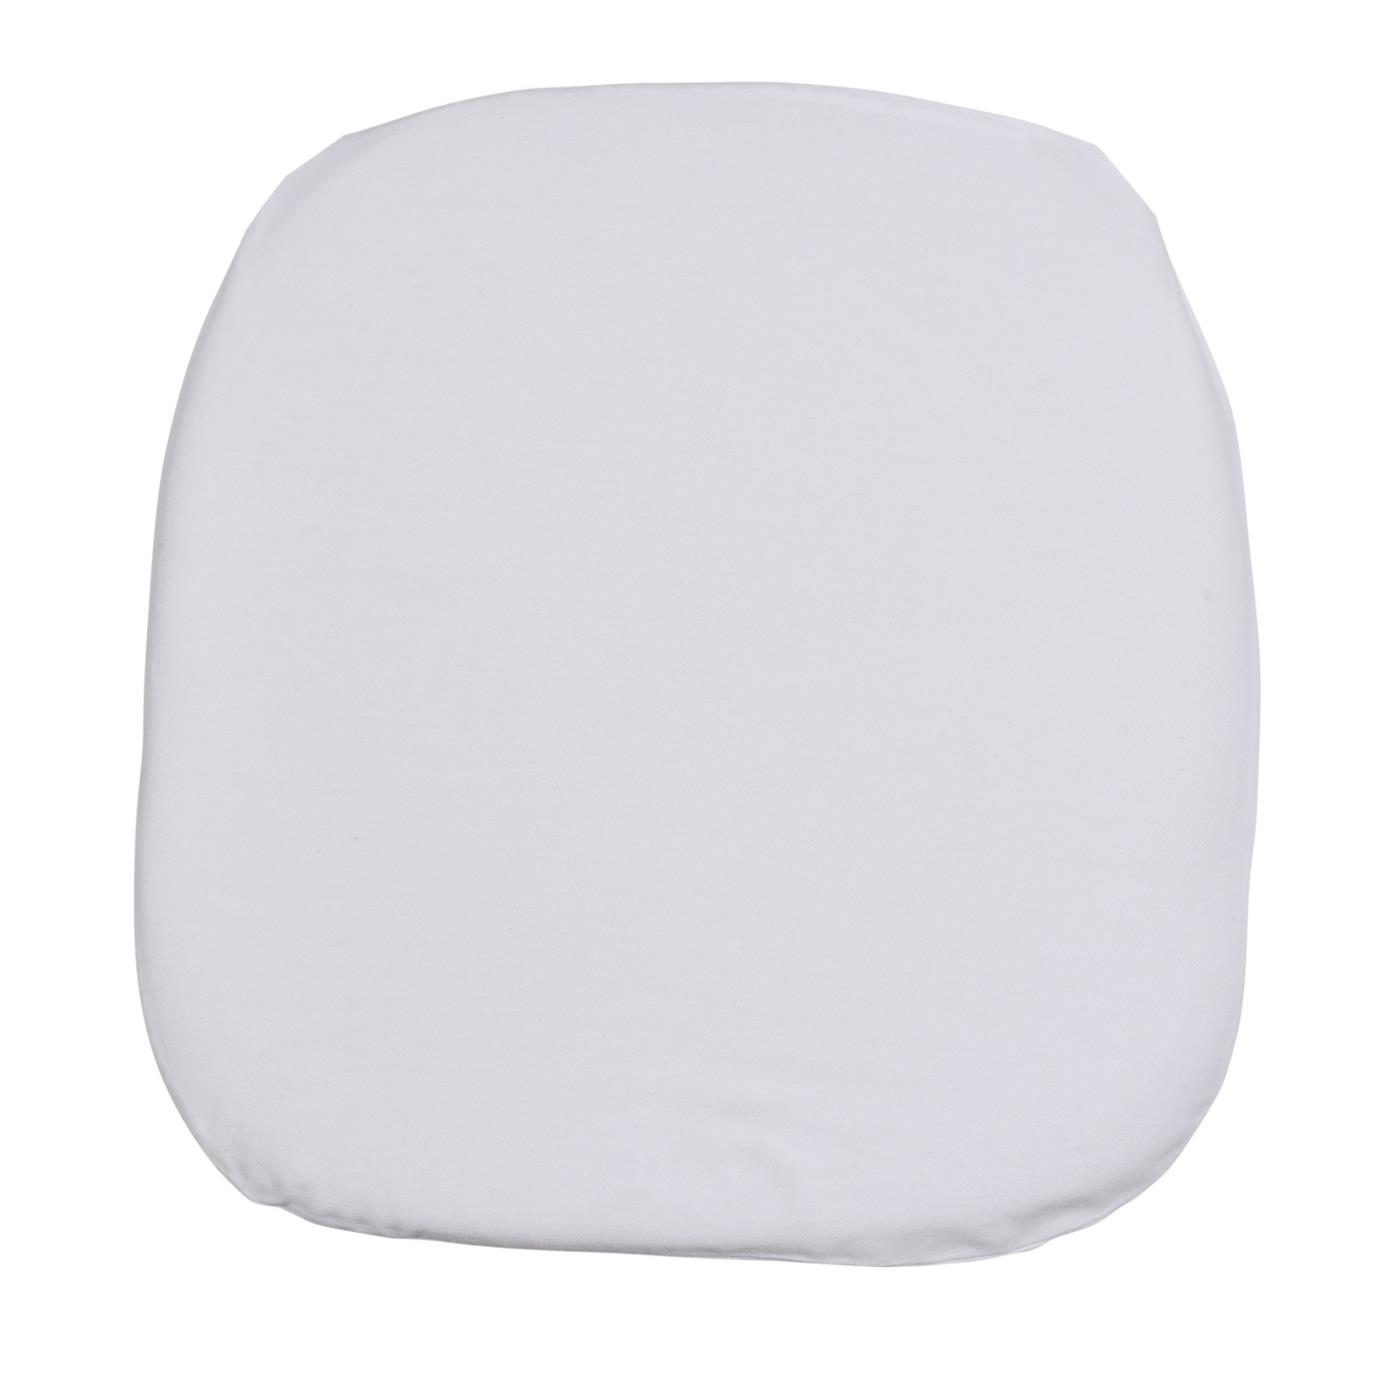 SD Spun Seat Cushion - White